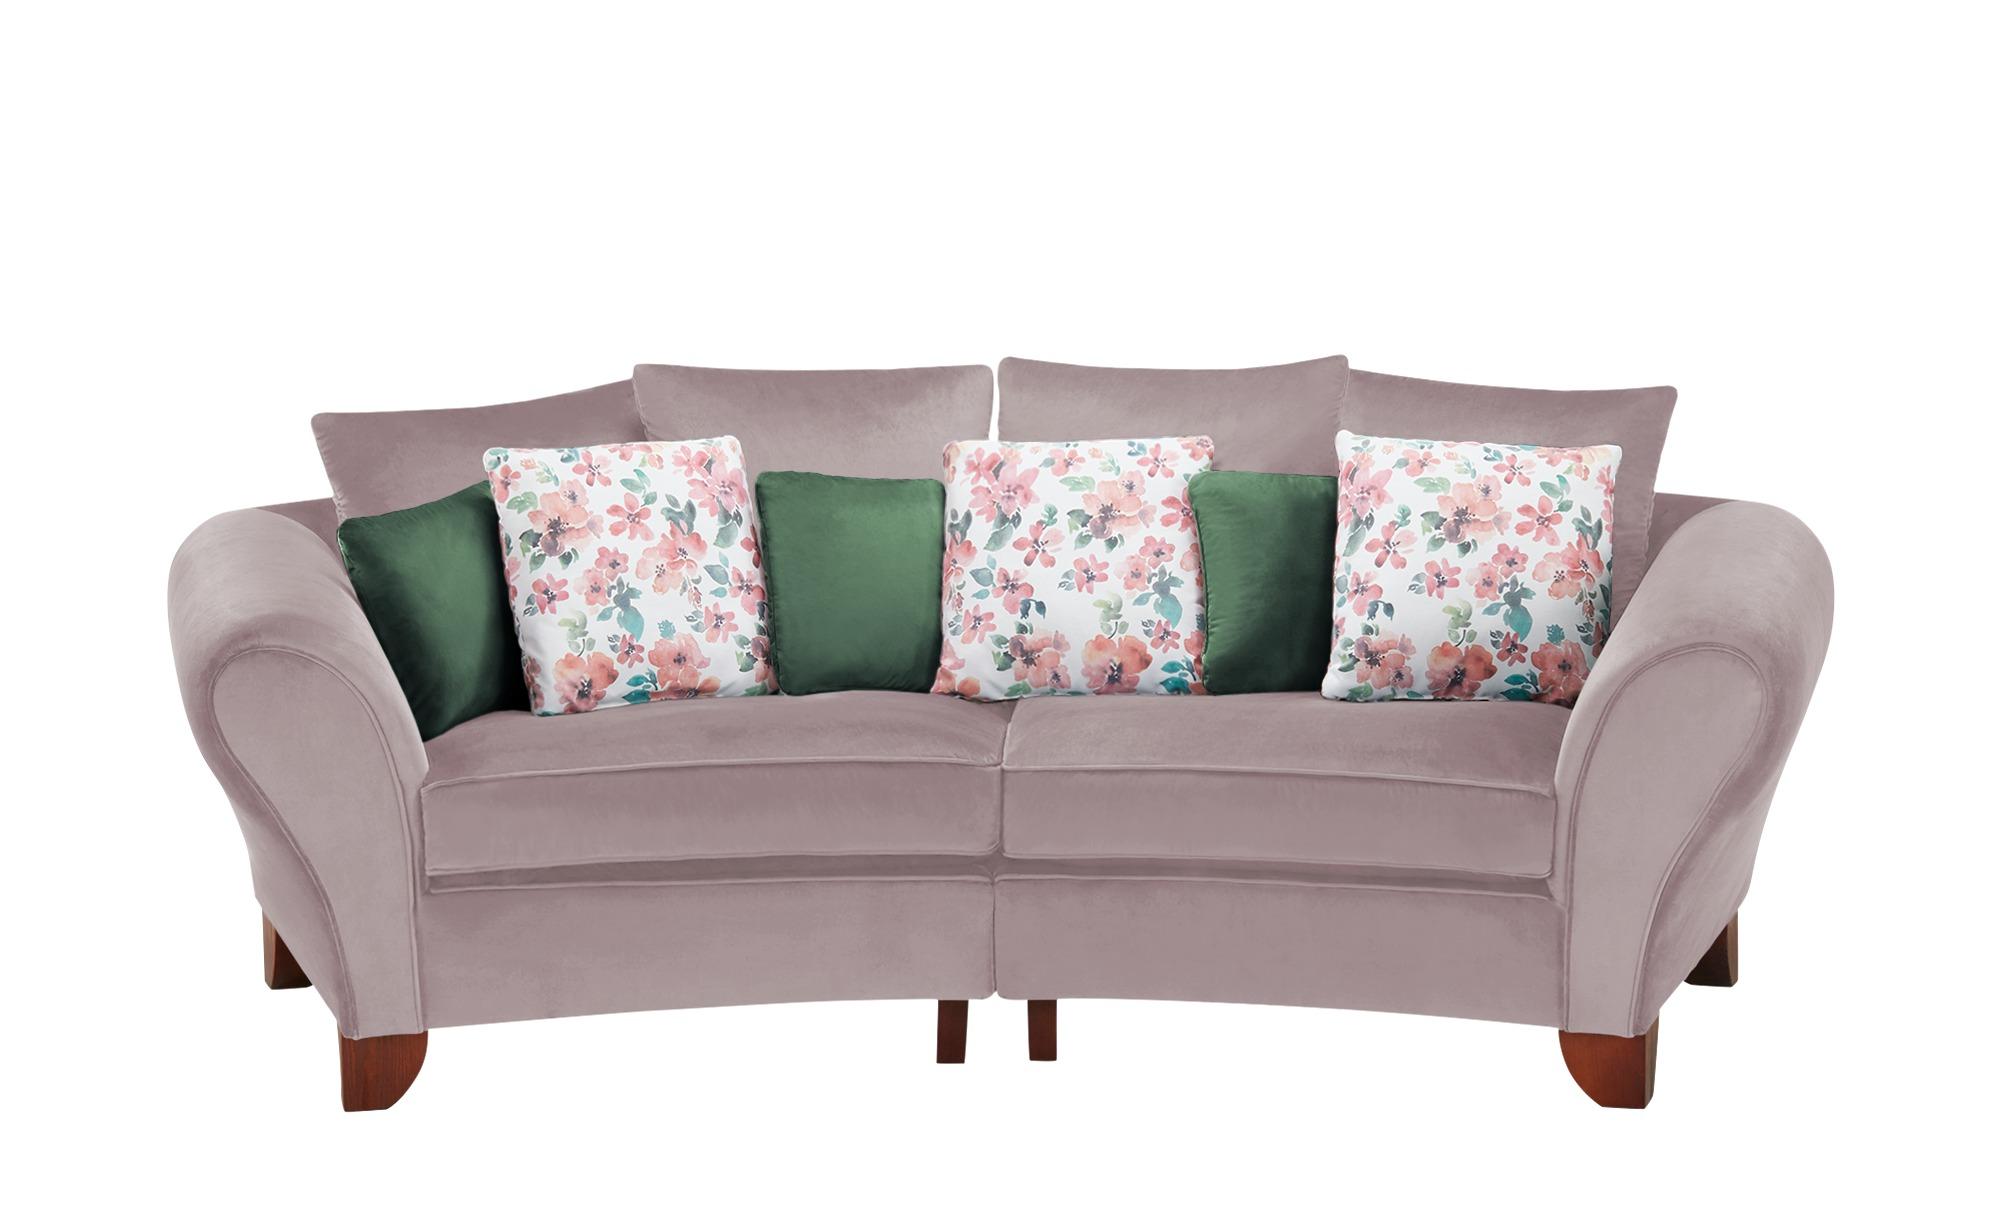 smart Big Sofa  Nadja ¦ rosa/pink ¦ Maße (cm): B: 277 H: 95 T: 108 Polstermöbel > Sofas > 3-Sitzer - Höffner